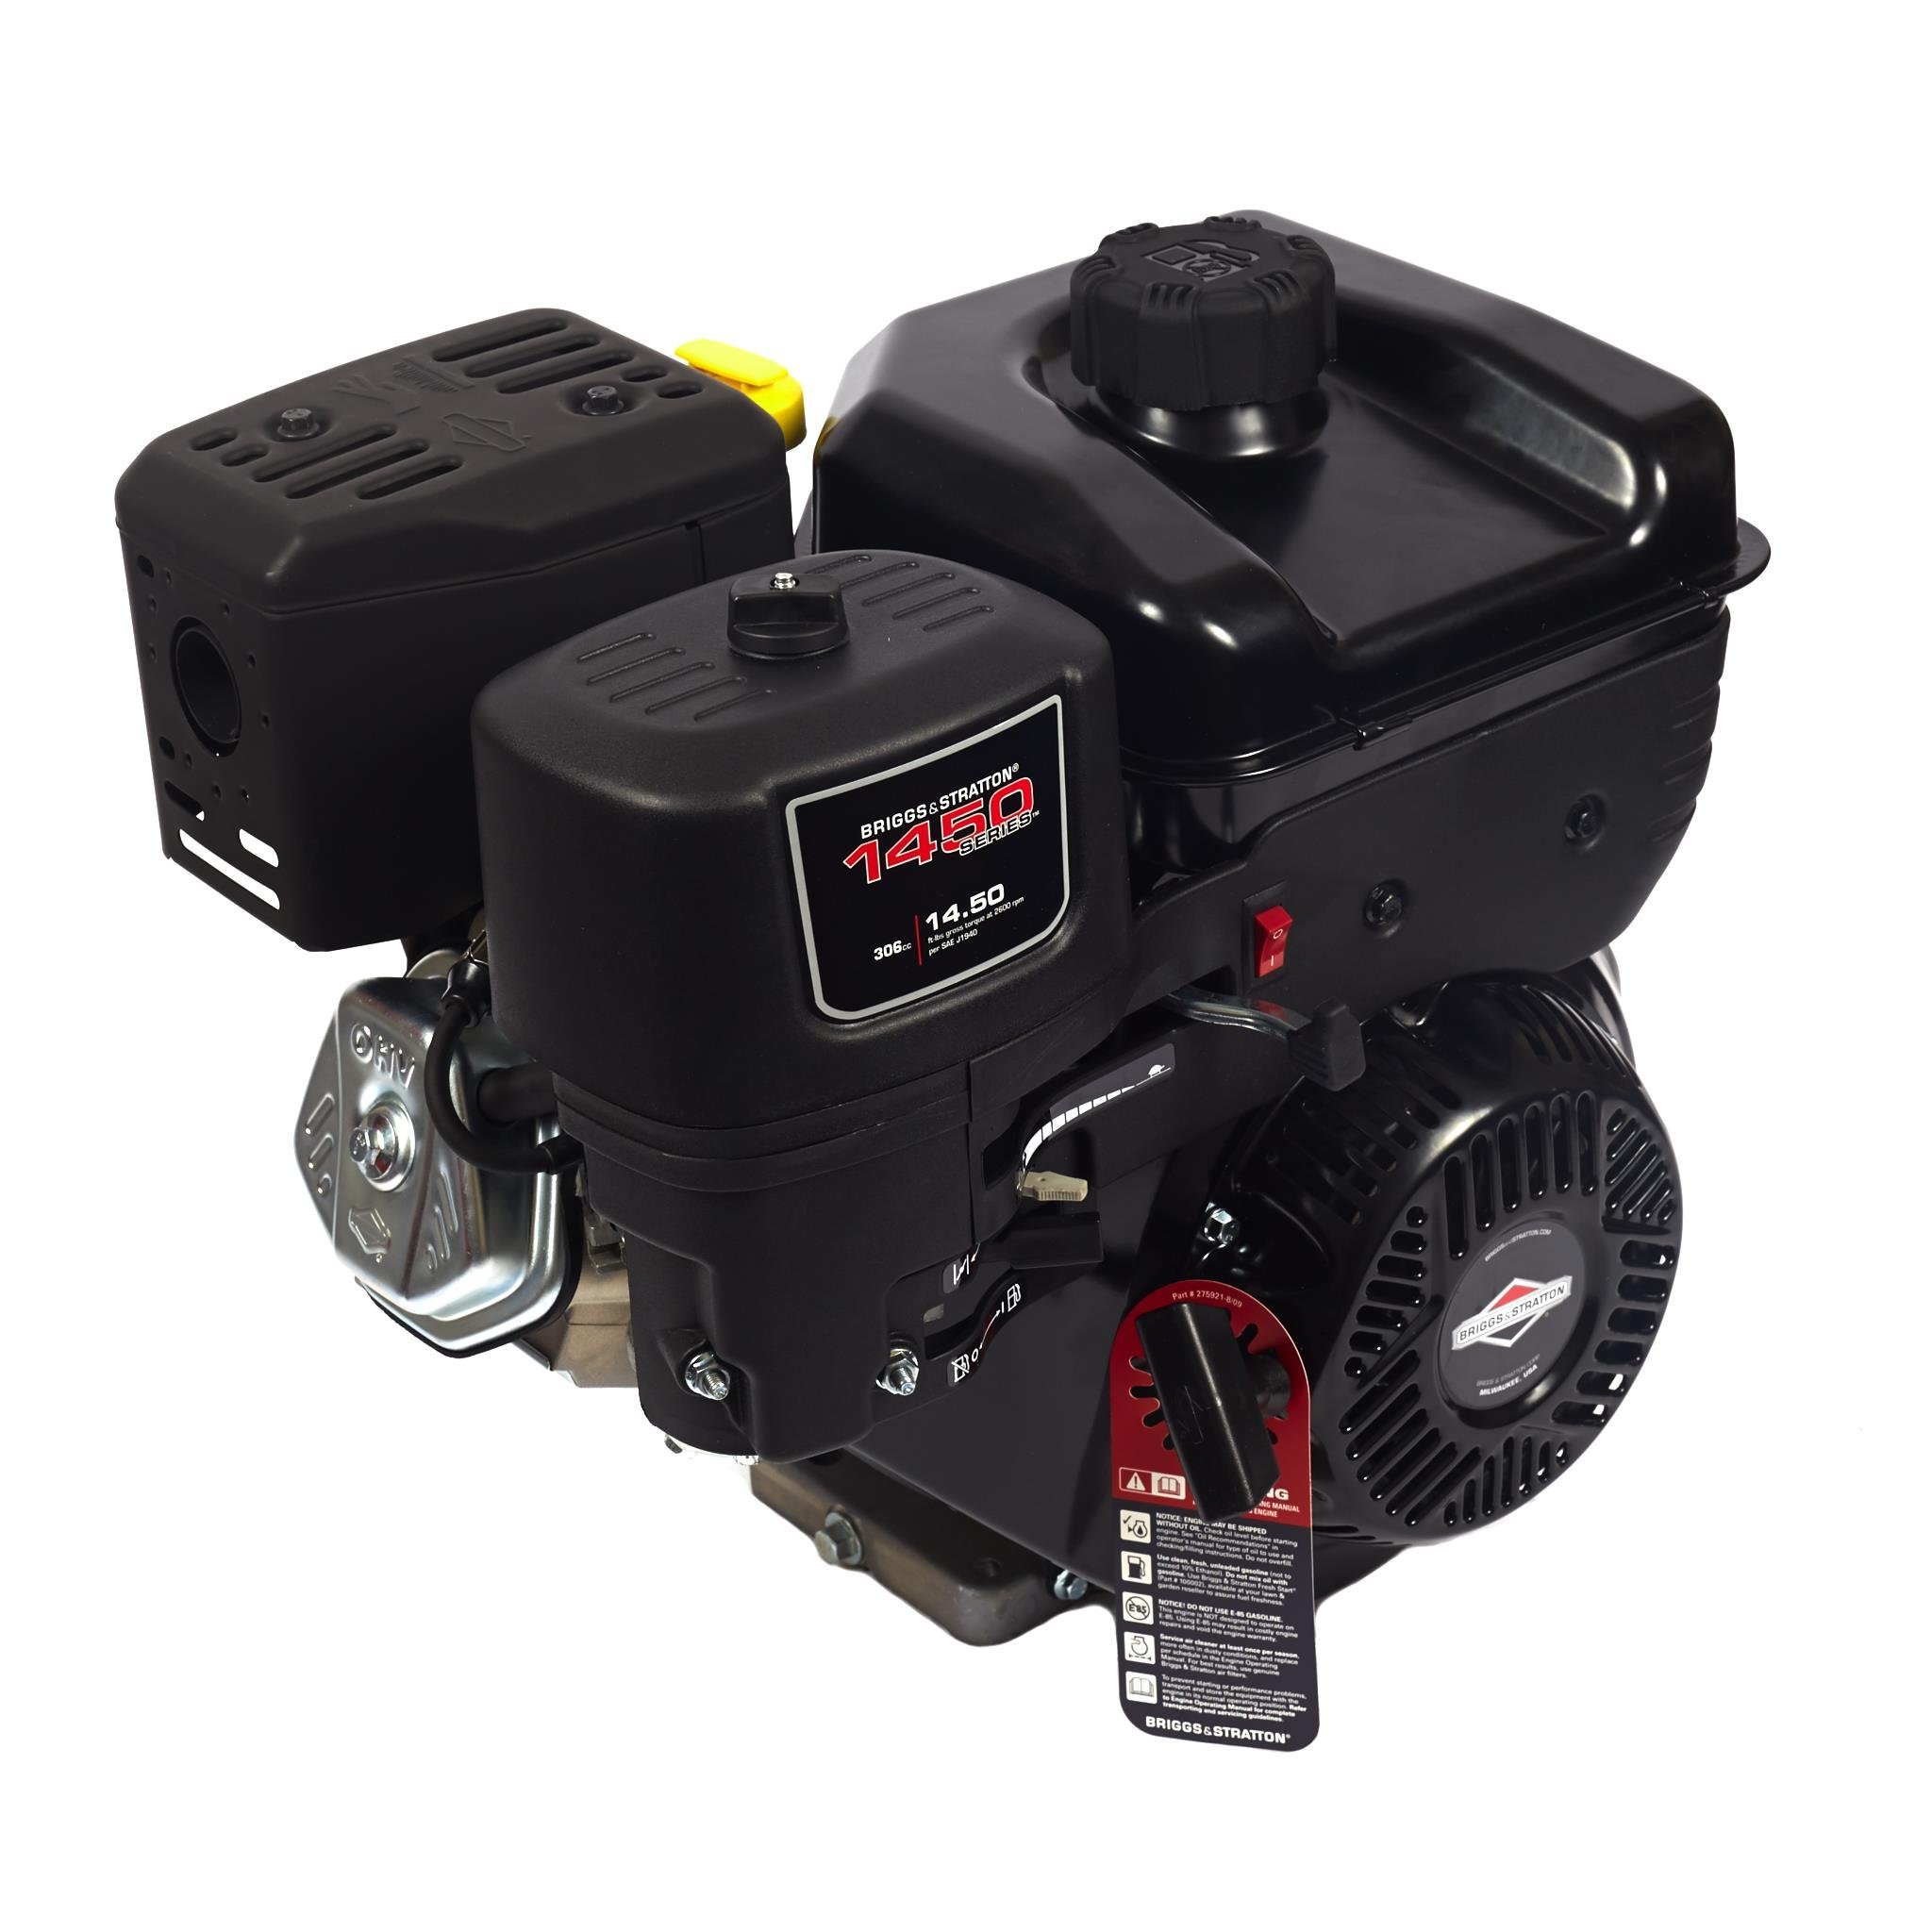 Gas Engine, 3750 RPM, 3.48 in. Shaft L by Briggs & Stratton